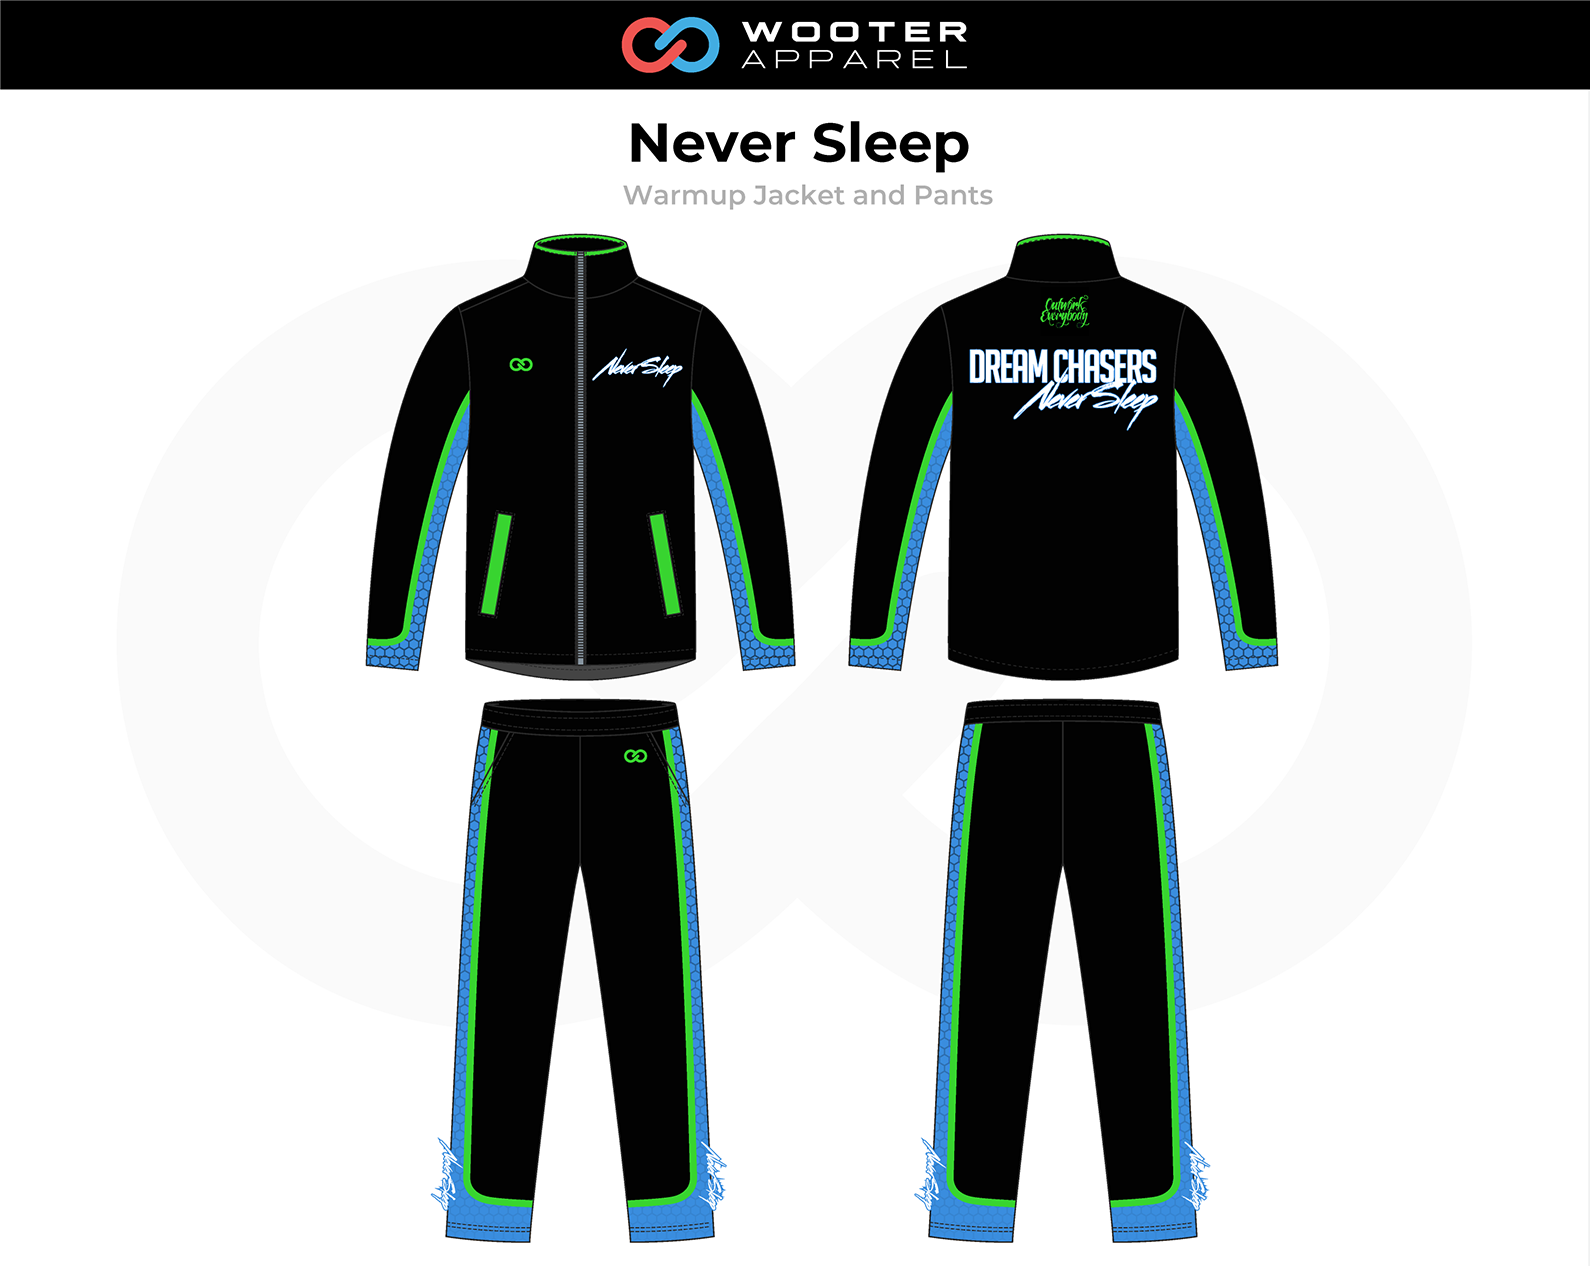 2018-11-14 Never Sleep Warmup Jacket and Pants 2.png